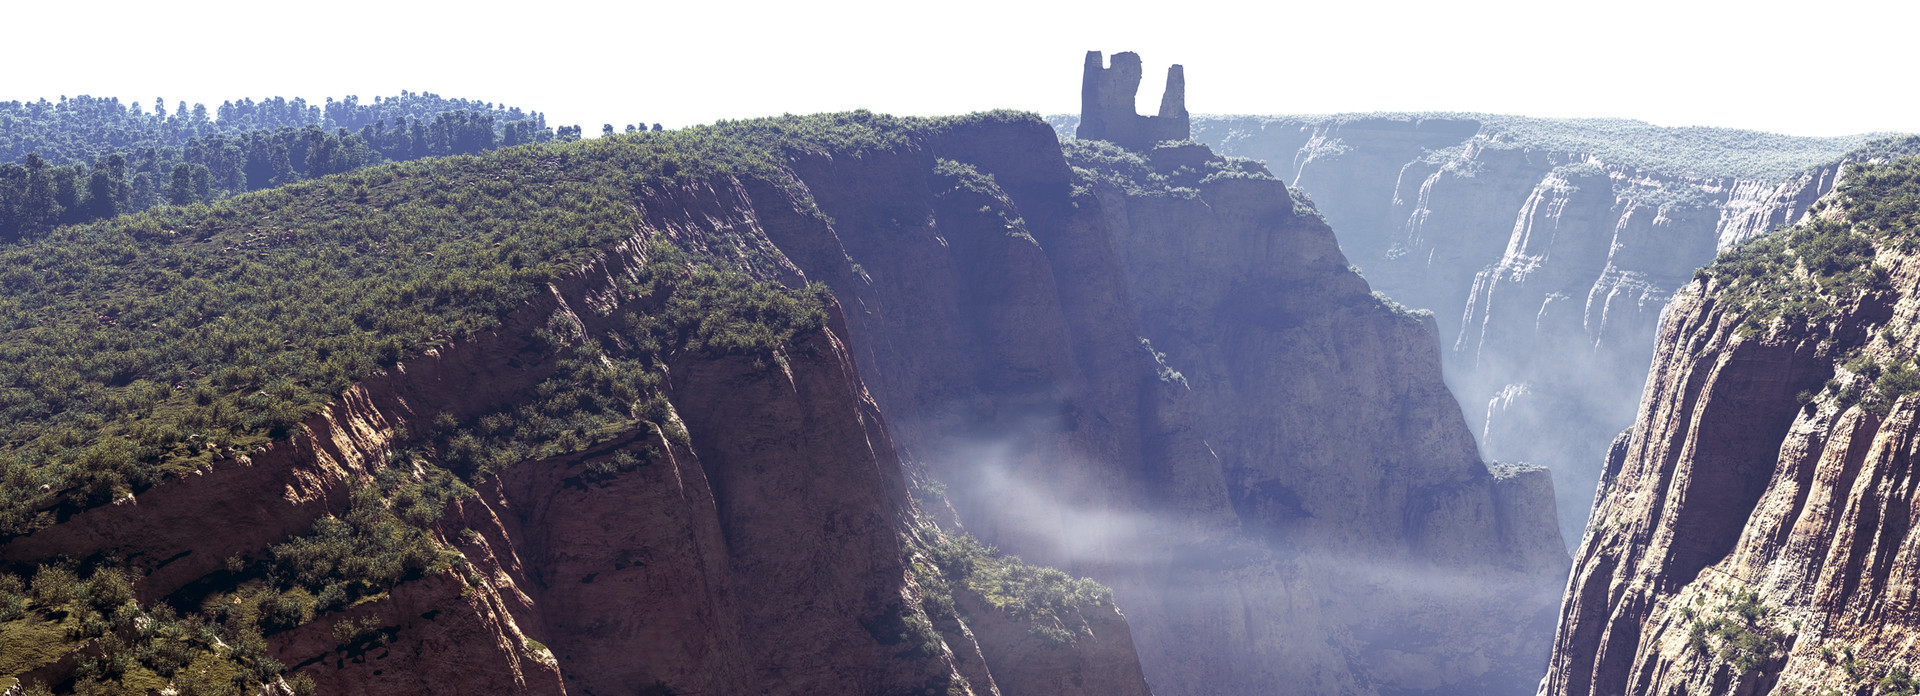 Kamolz_Blue gorge part 2